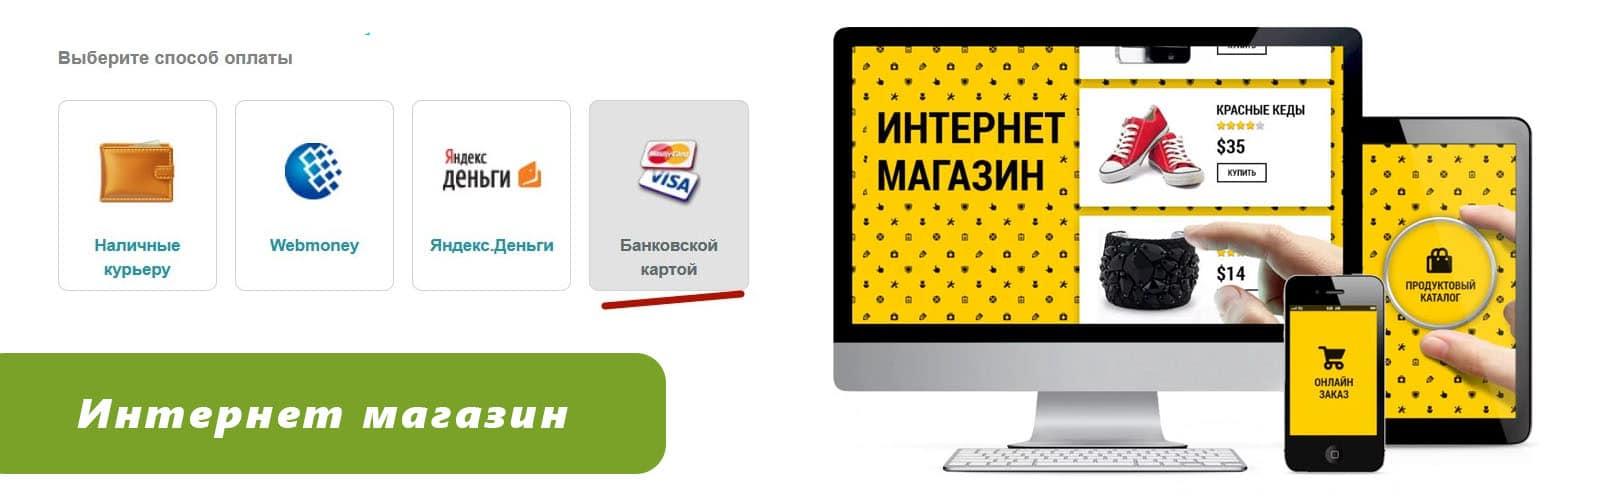 Интернет магазин